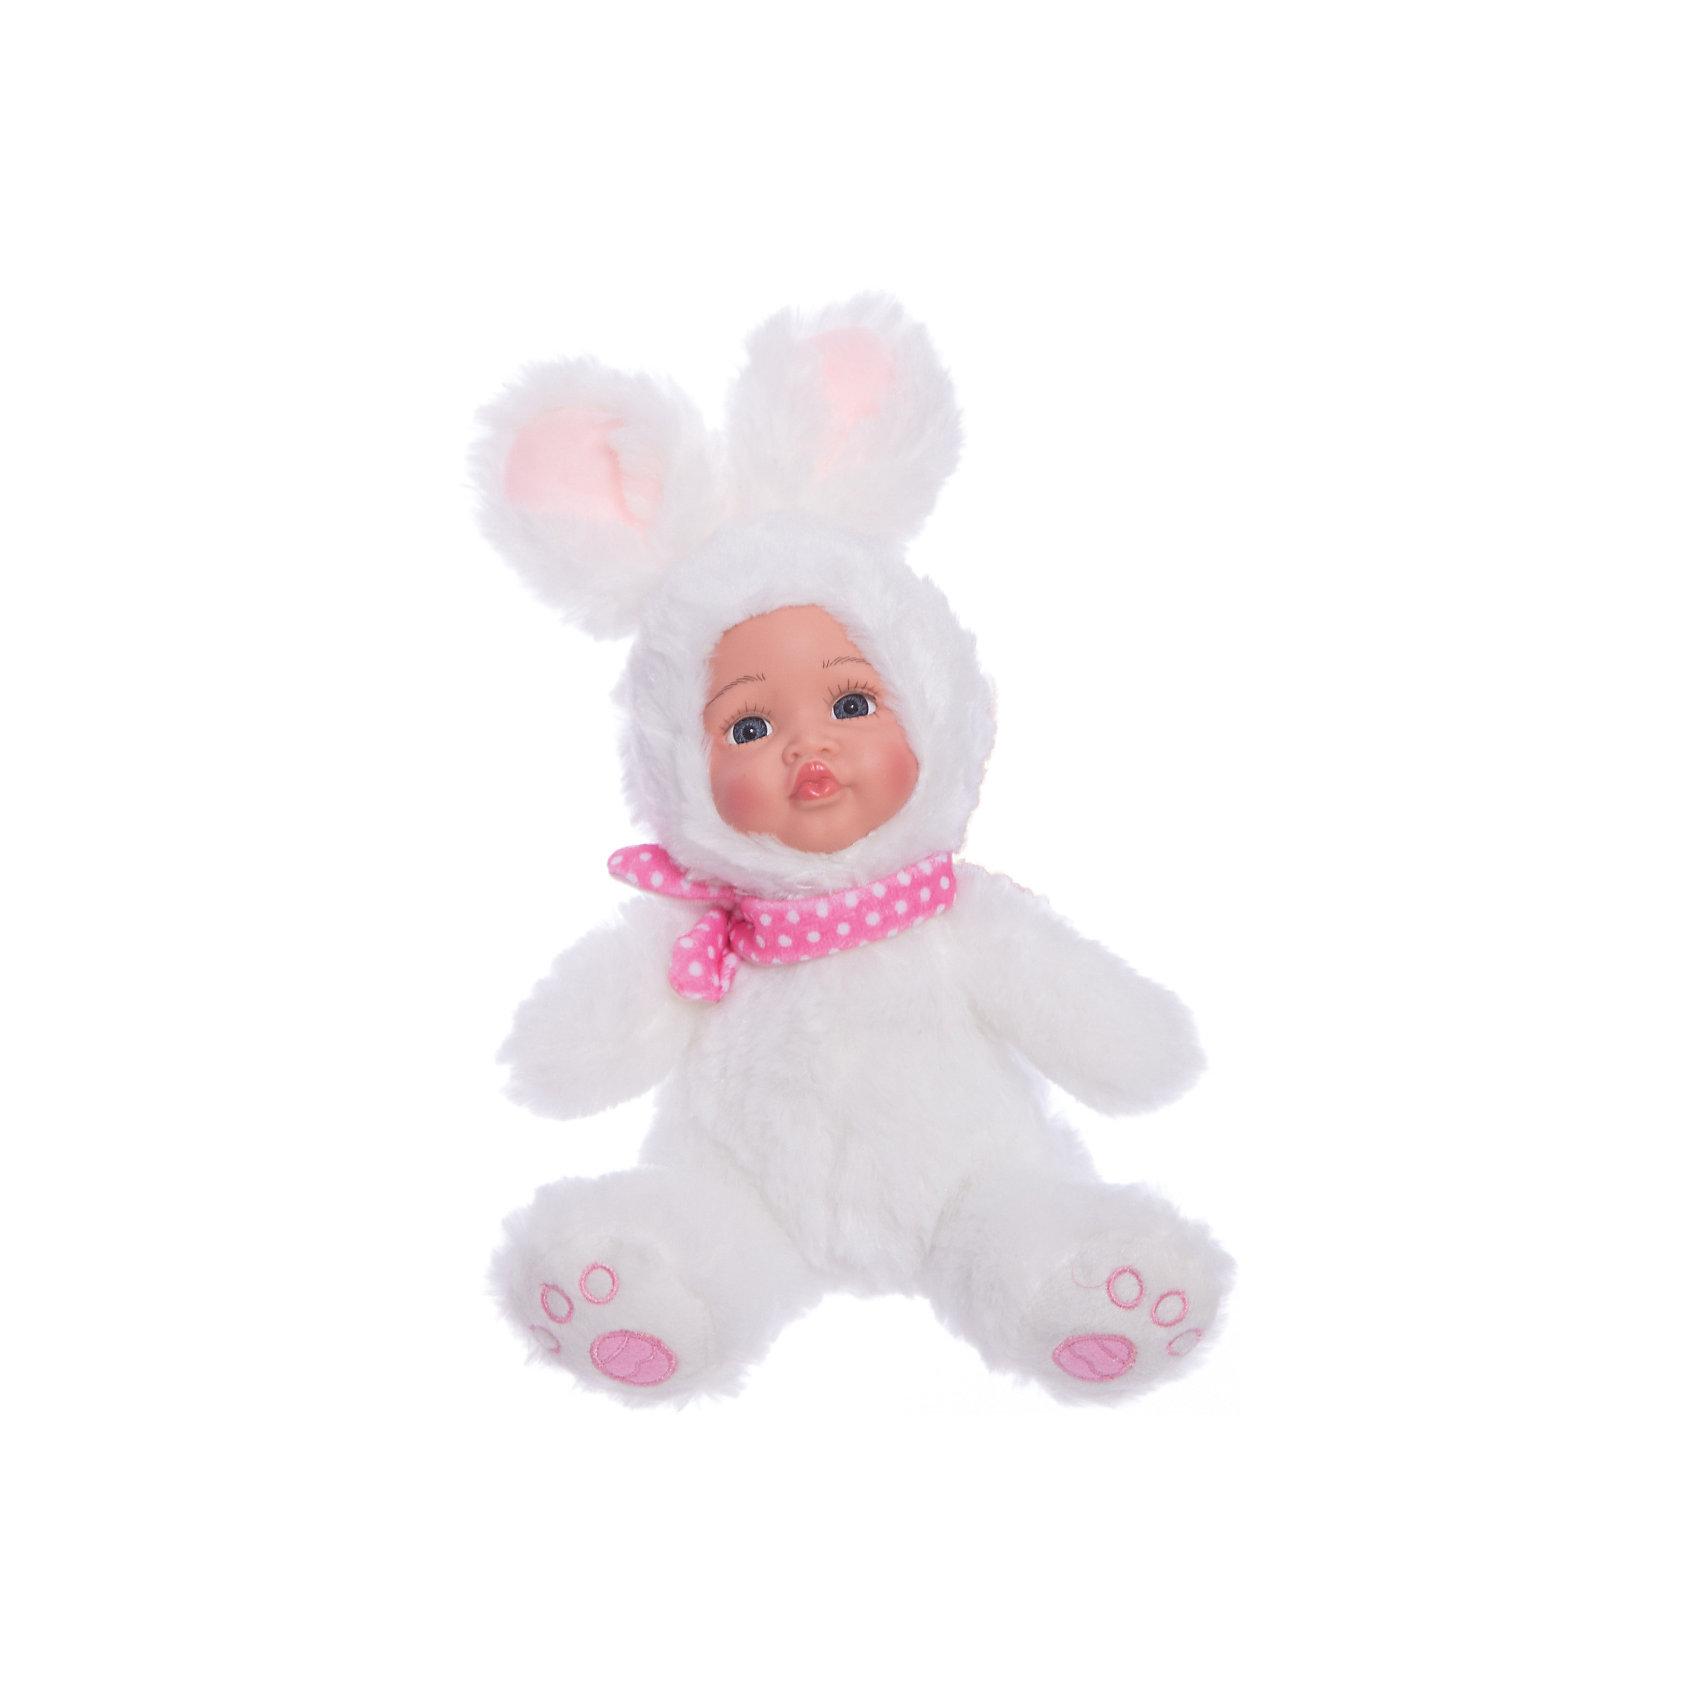 Fluffy Family Игрушка Мой зайка, Fluffy Family игрушка мгка fluffy family диджей 681031